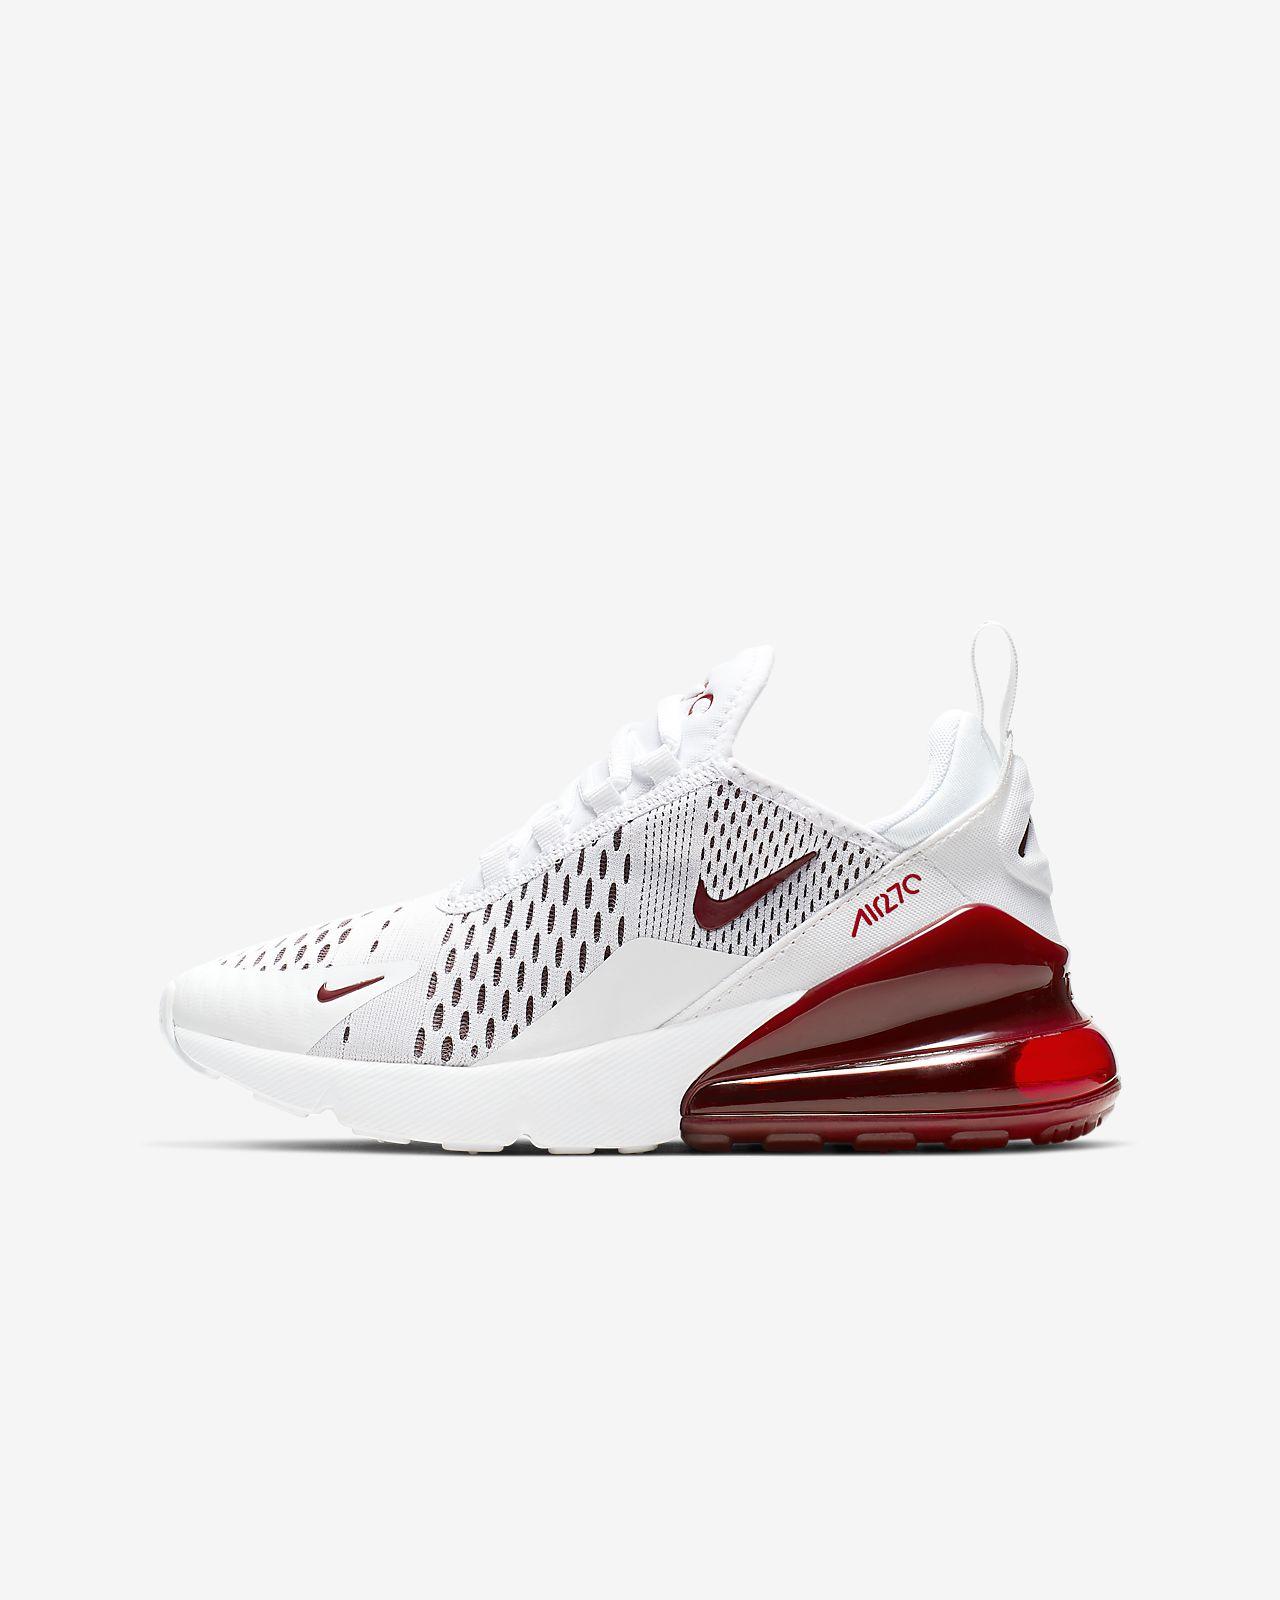 Schuh Kinder 270 Für Nike Max Ältere Air I6Yvmfygb7